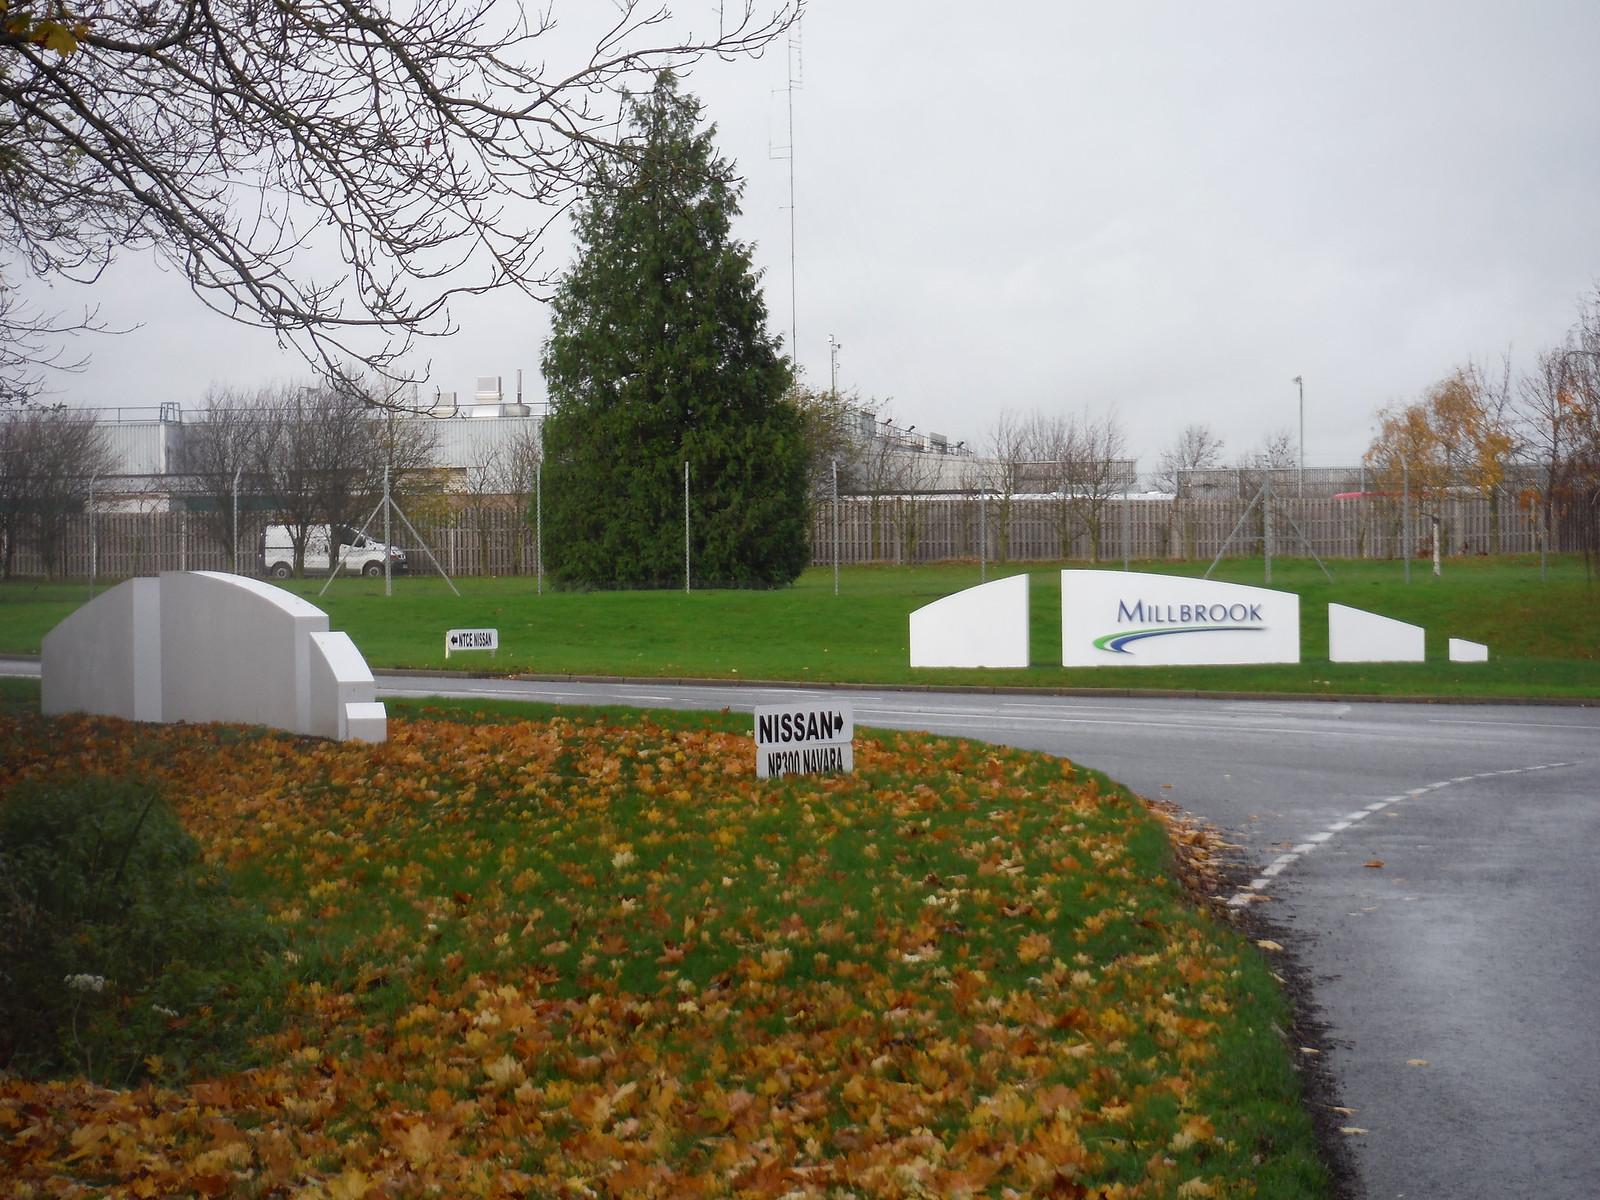 Entrance to Millbrook Vehicle Proving Ground SWC Walk 232 Lidlington to Flitwick